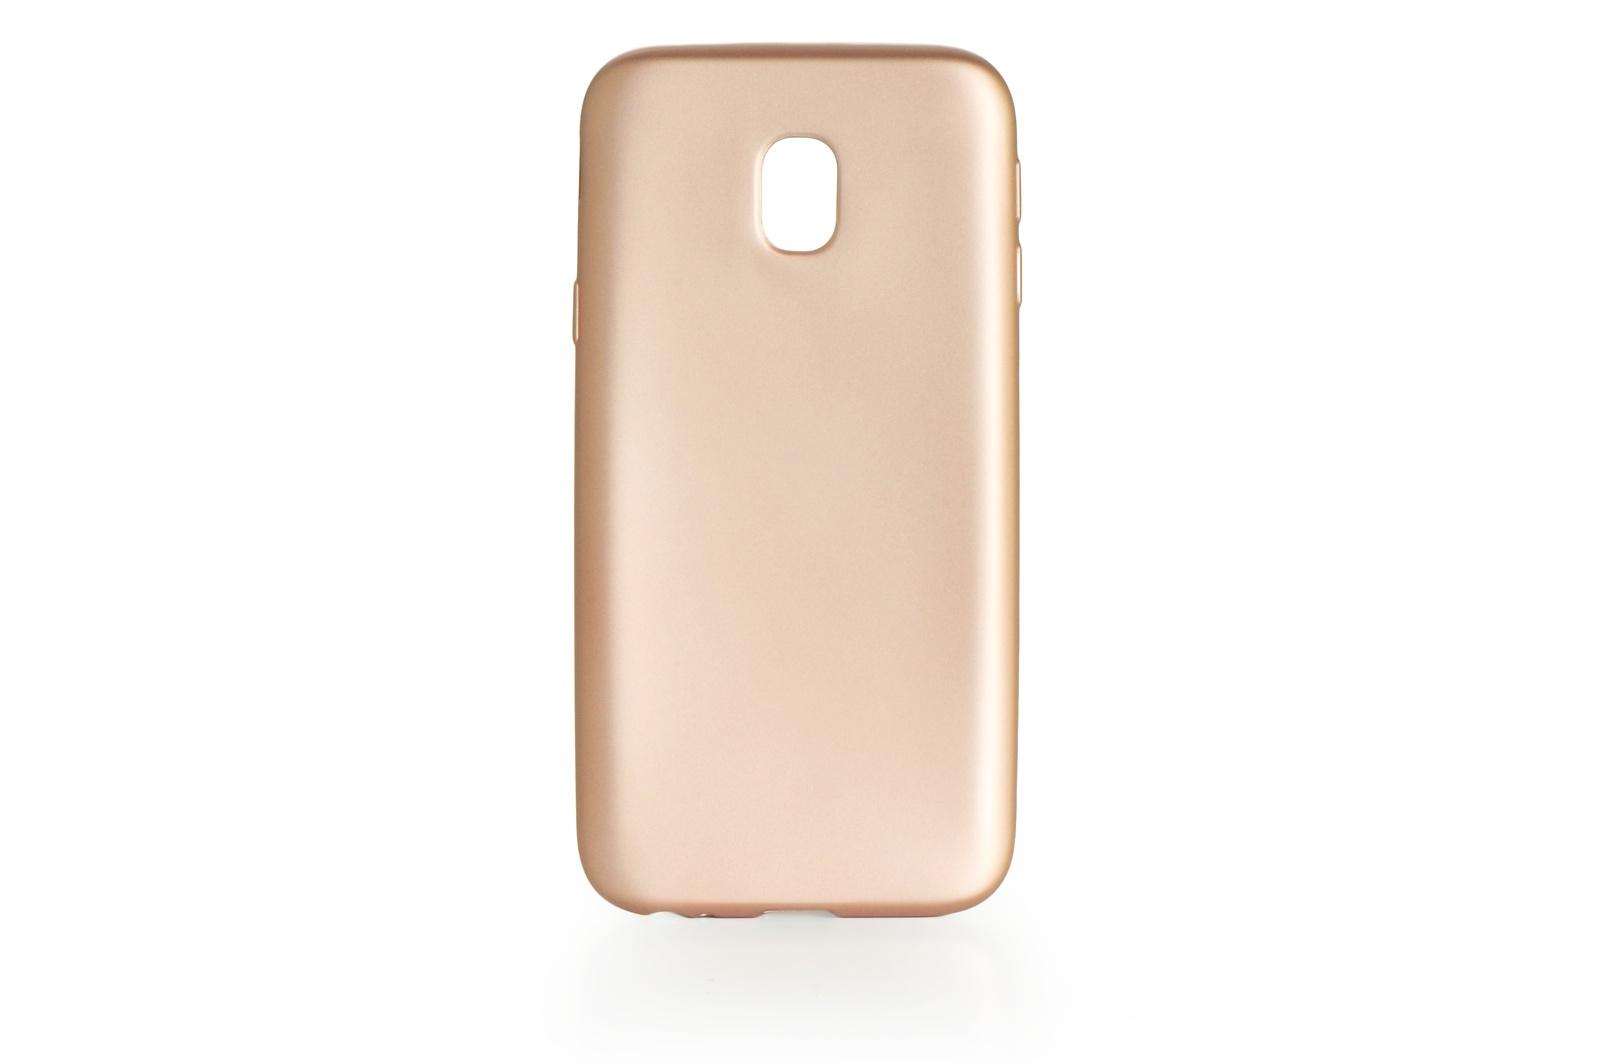 Чехол для сотового телефона Gurdini силикон Soft Touch 904946 для Samsung Galaxy J3 2017 (J 330), золотой